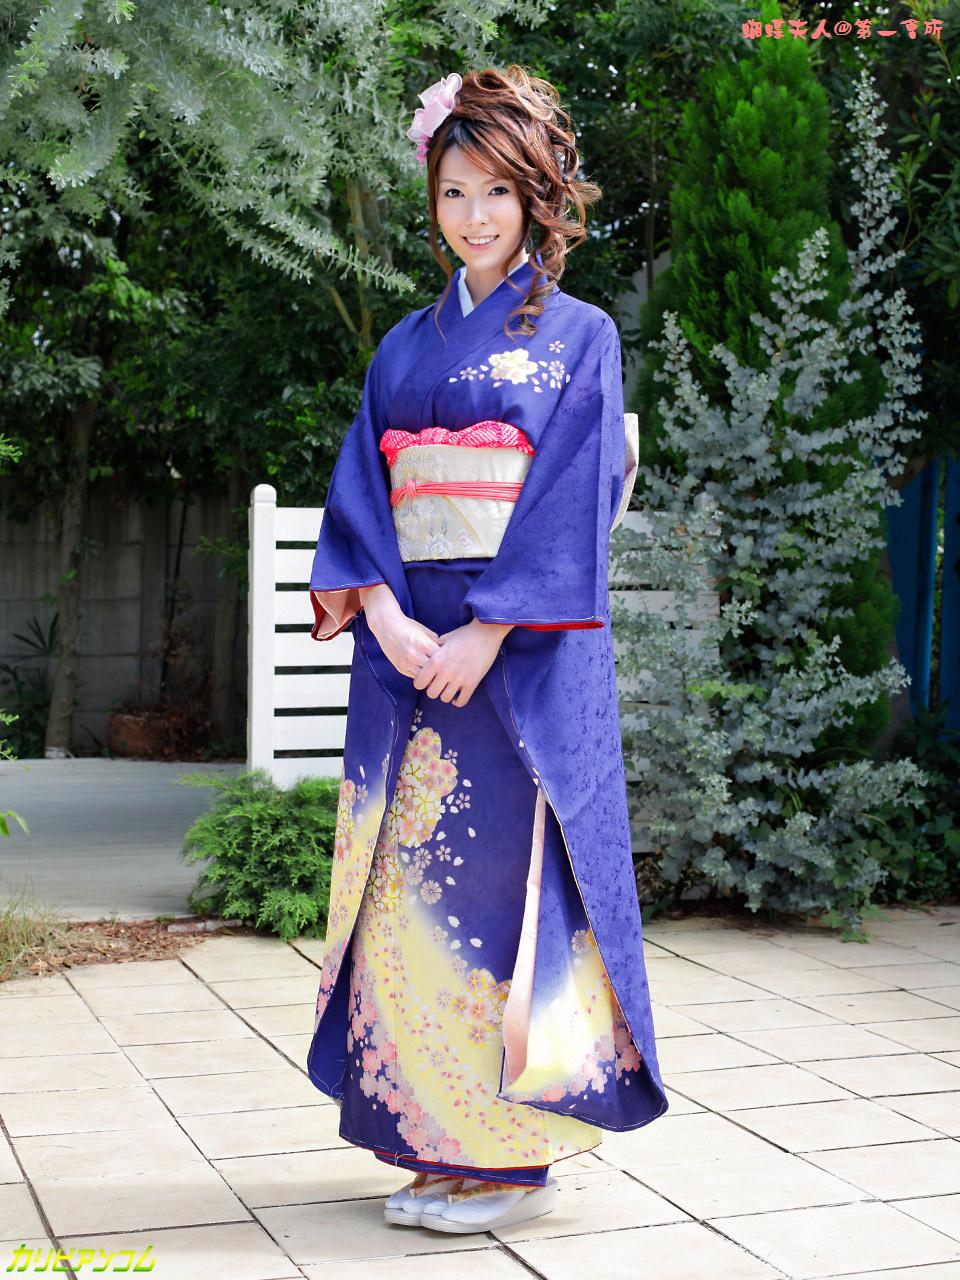 Секс кукла цельнолитая yui hatano japanese отзывы 11 фотография